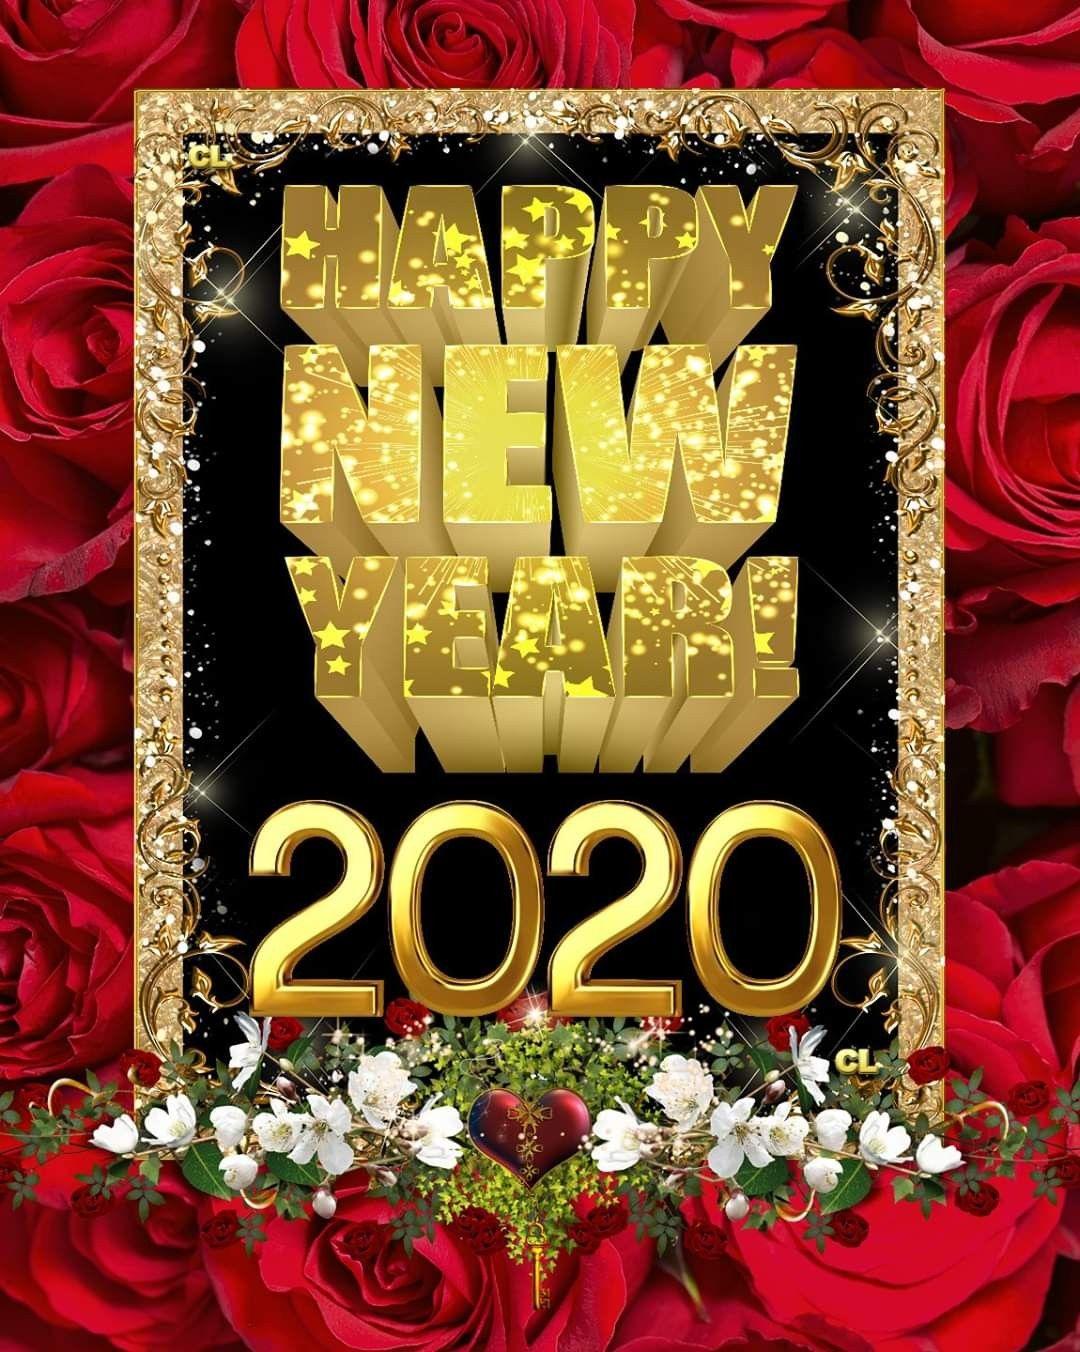 Pin by wanda riggan on Happy New Year 2020 !!! in 2020